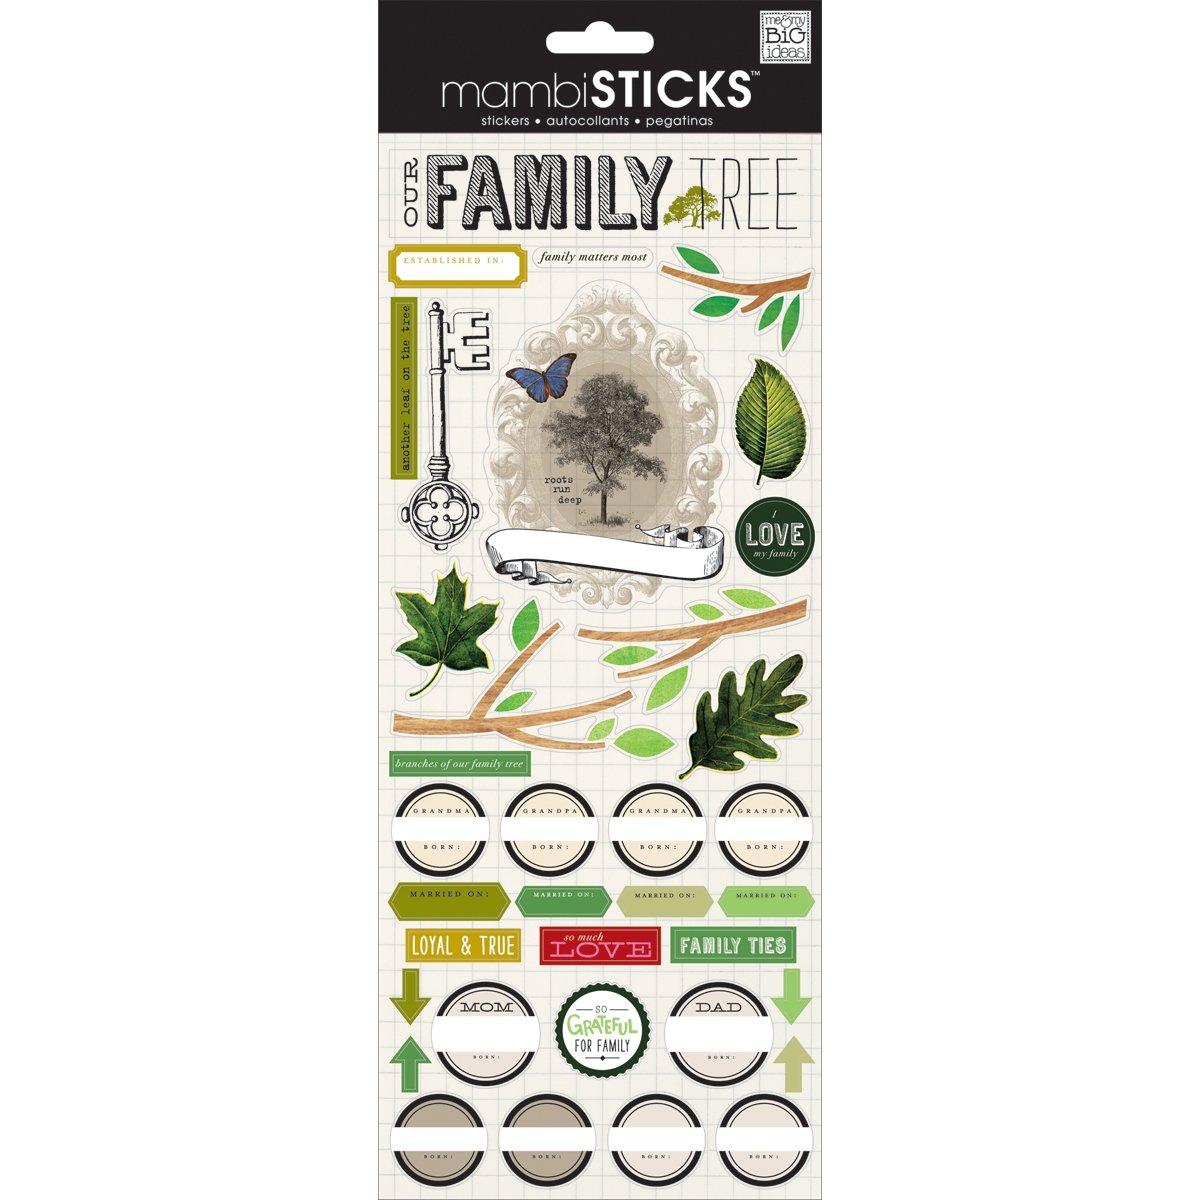 Mambi Family Stickers